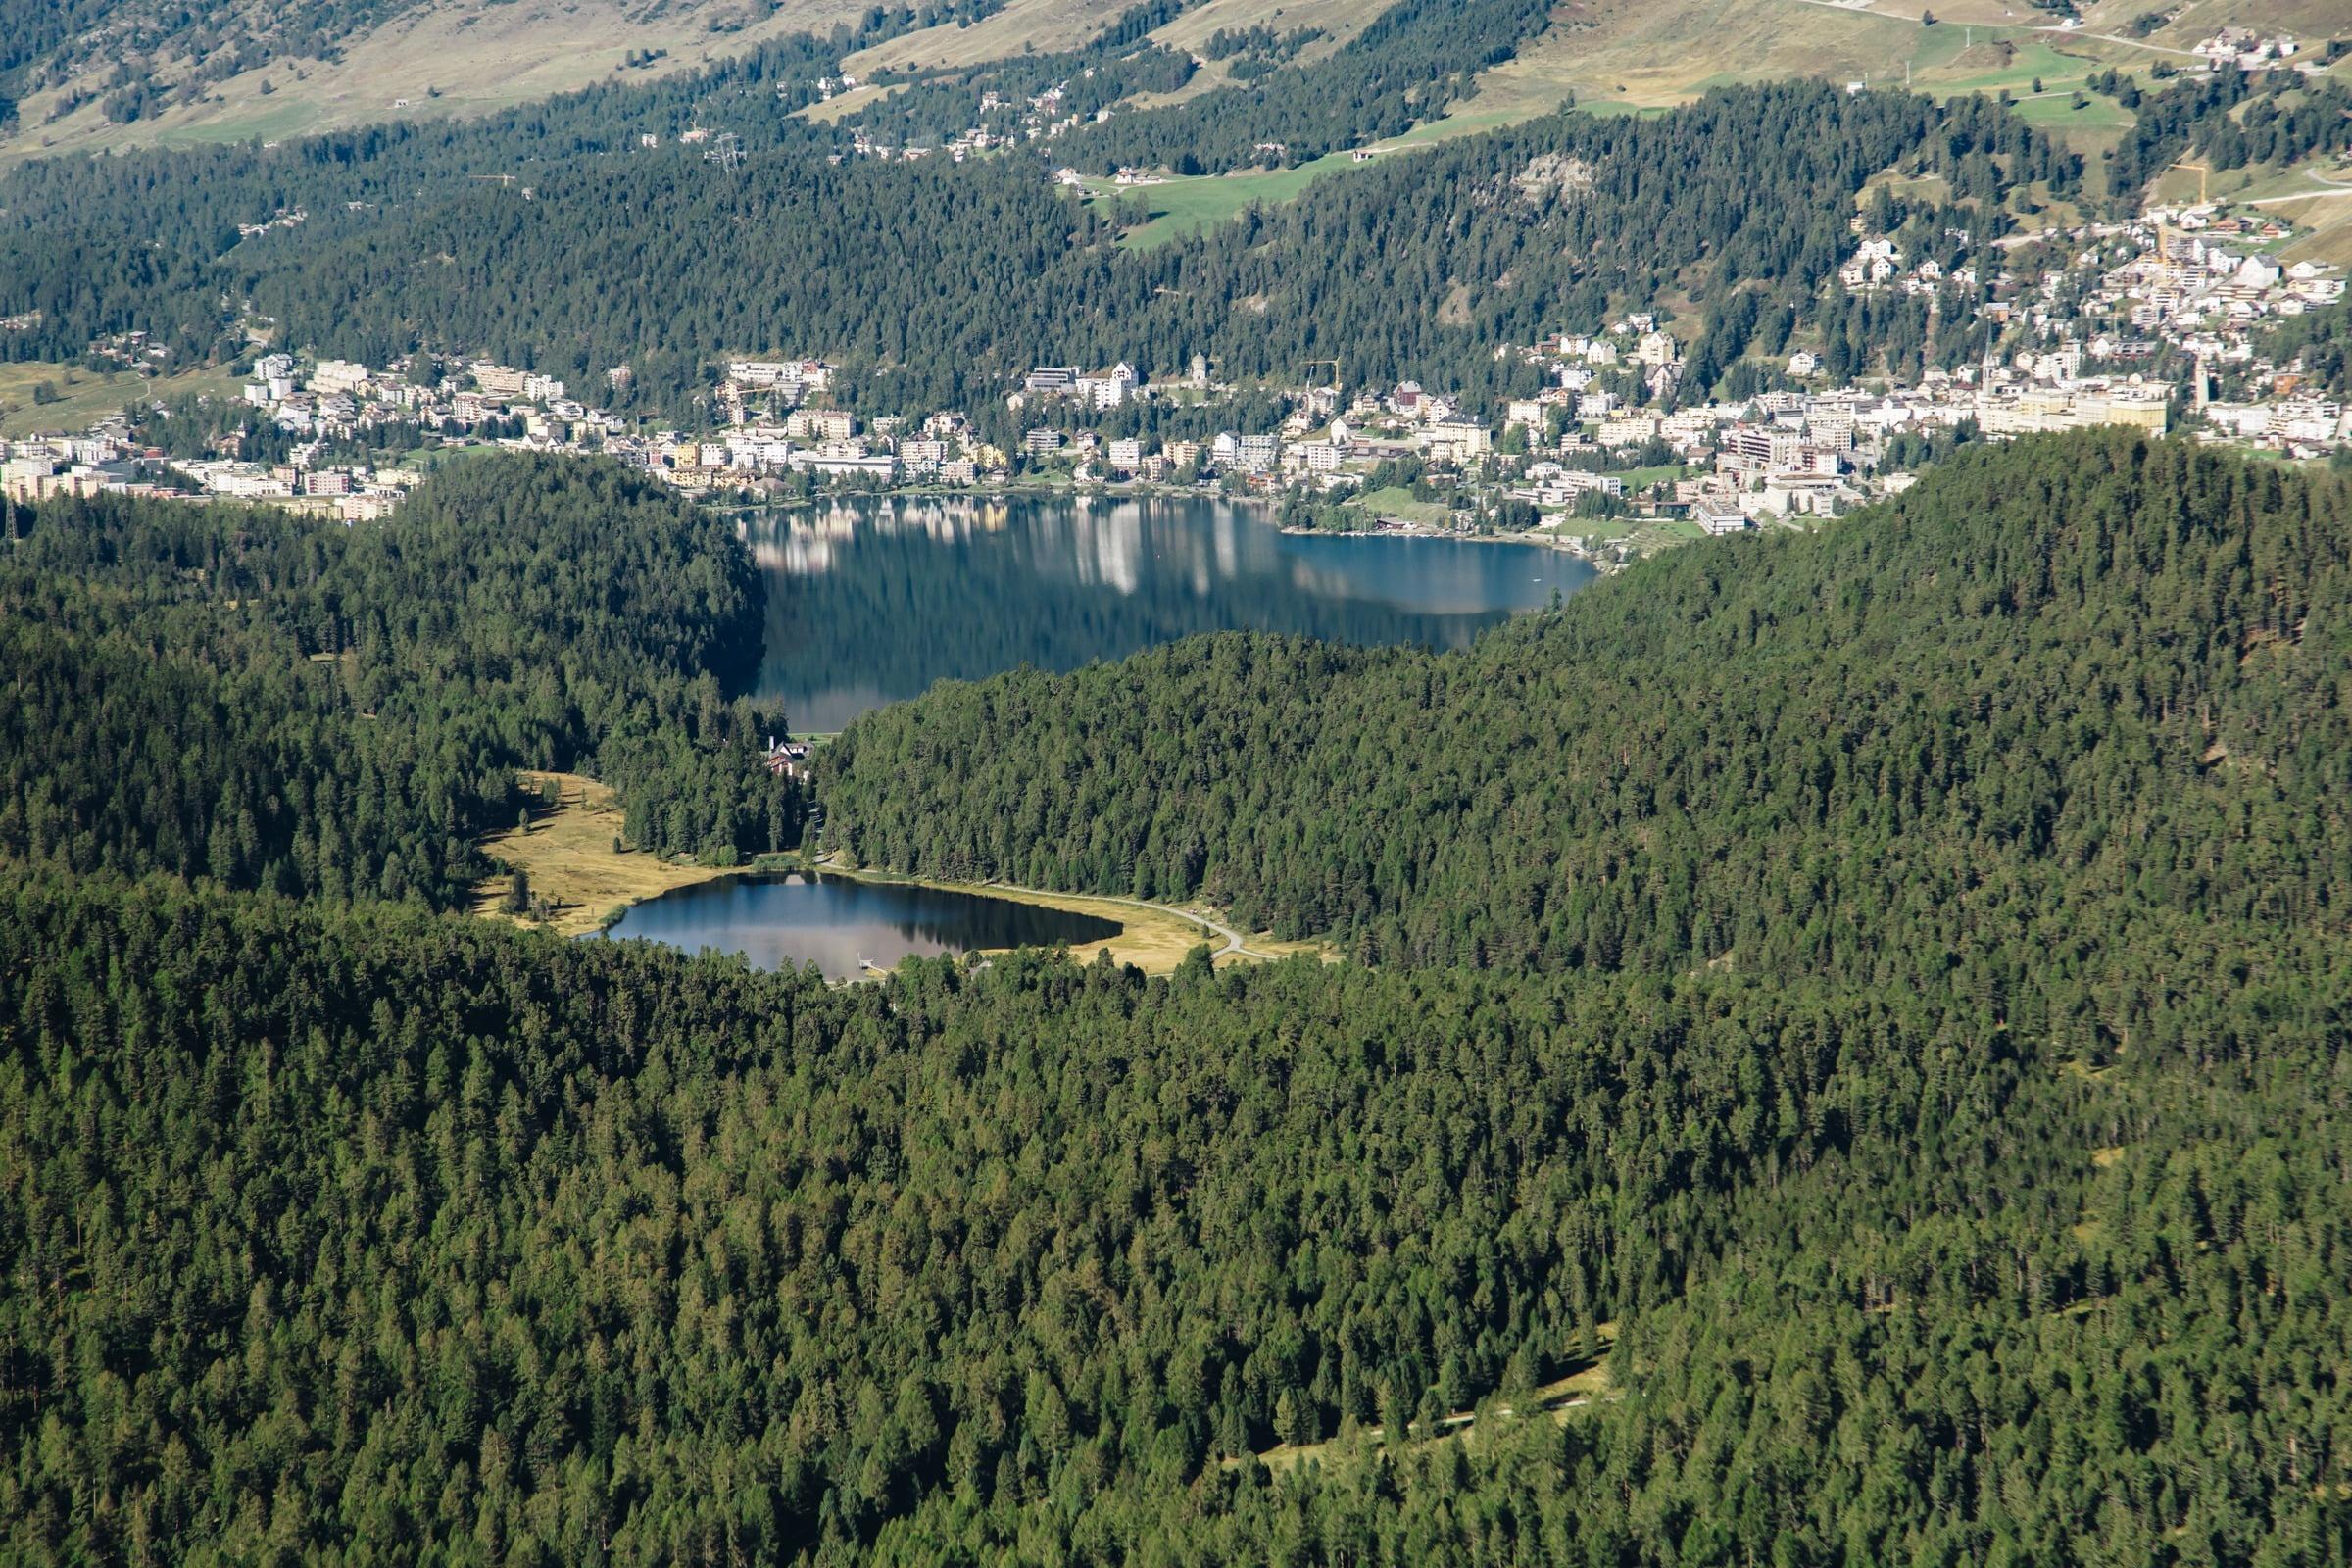 St. Moritz Tourist Information Dorf